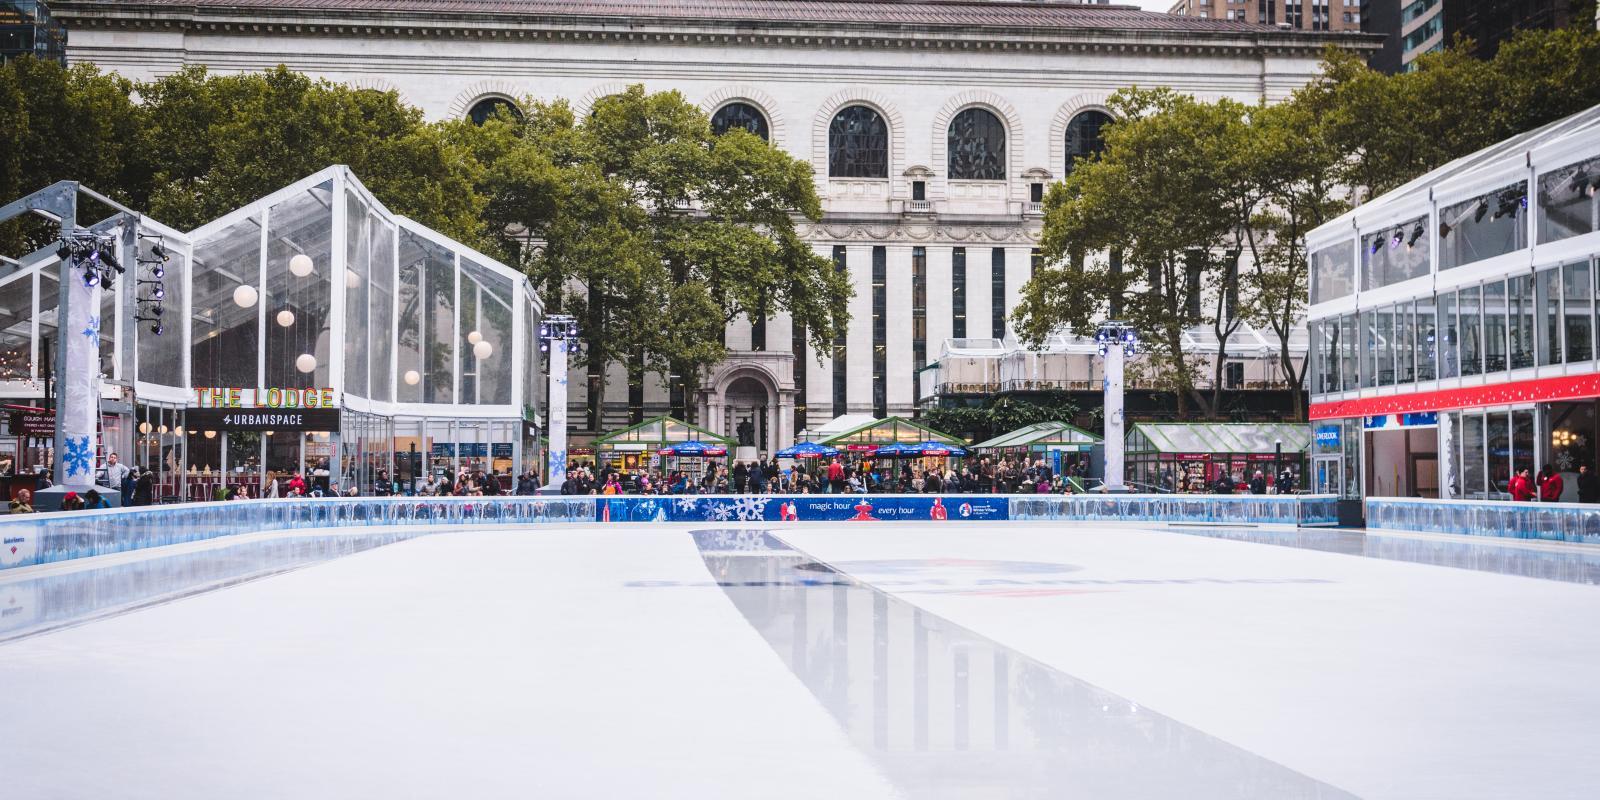 Bryant Park Ice Rink